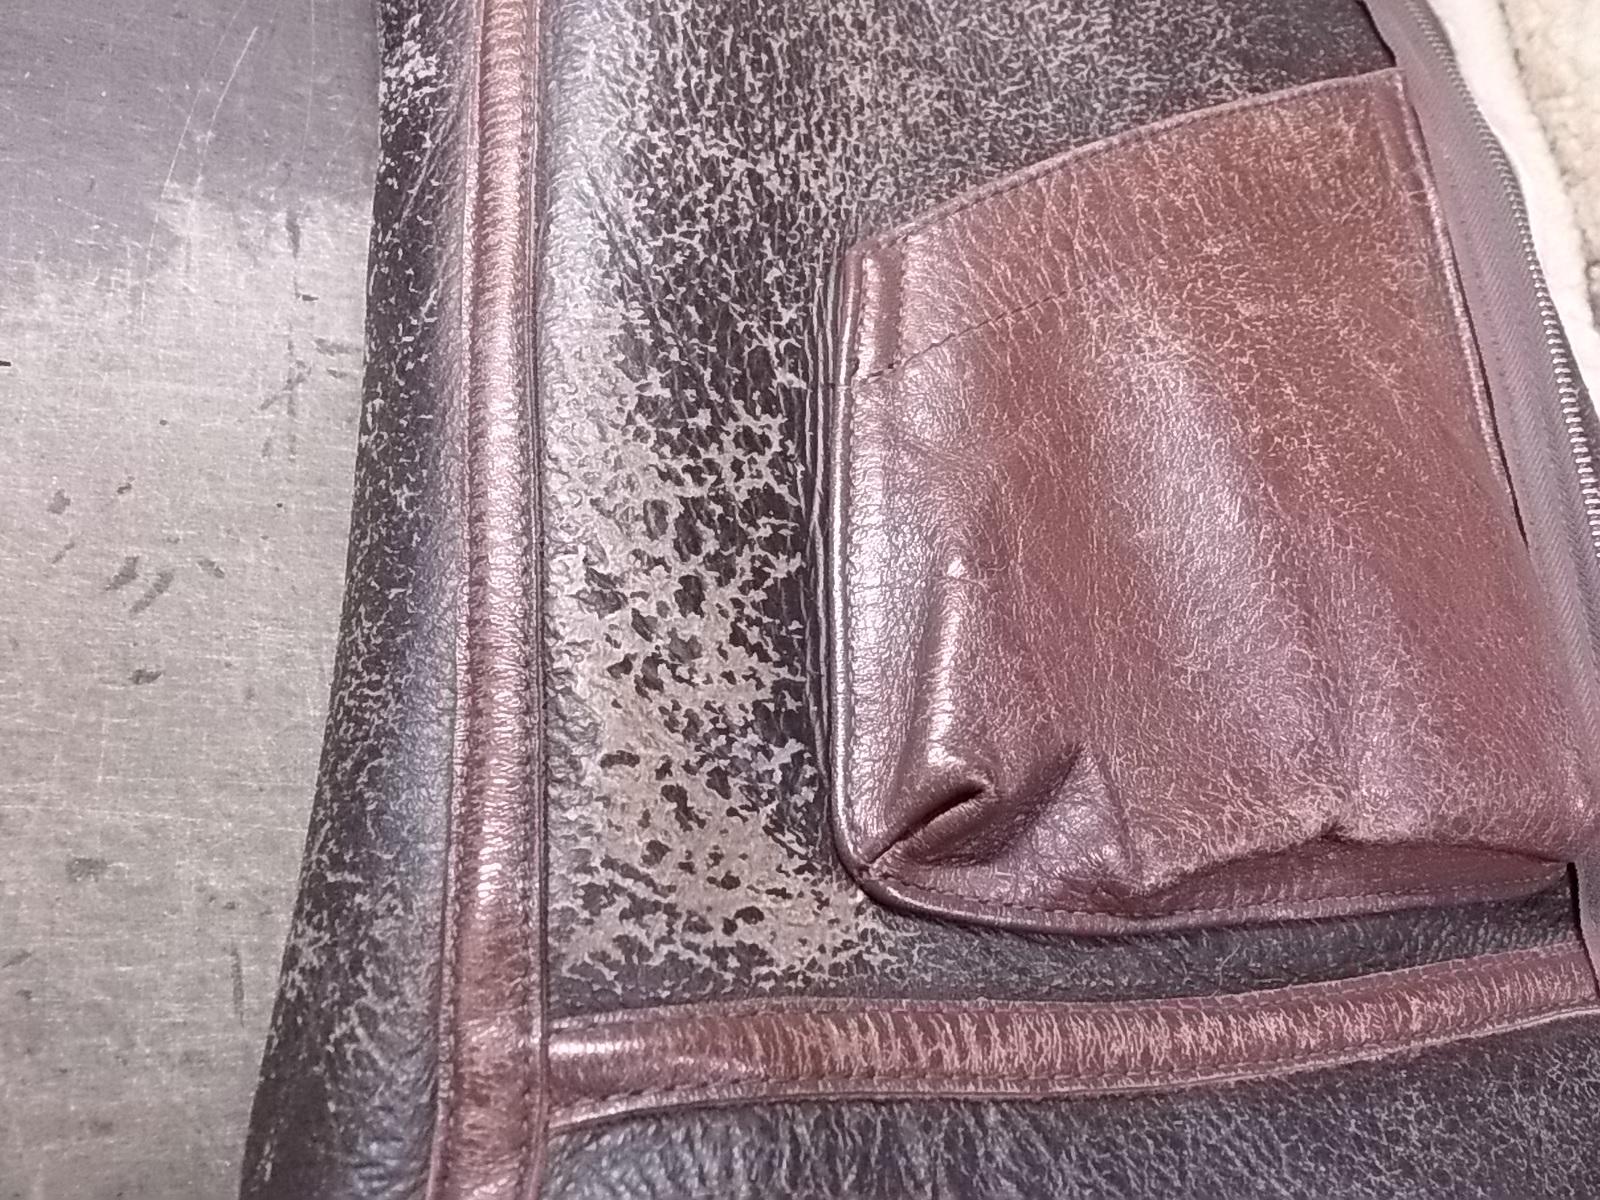 B3ジャケット劣化した塗装面を全塗装して相棒復活!!